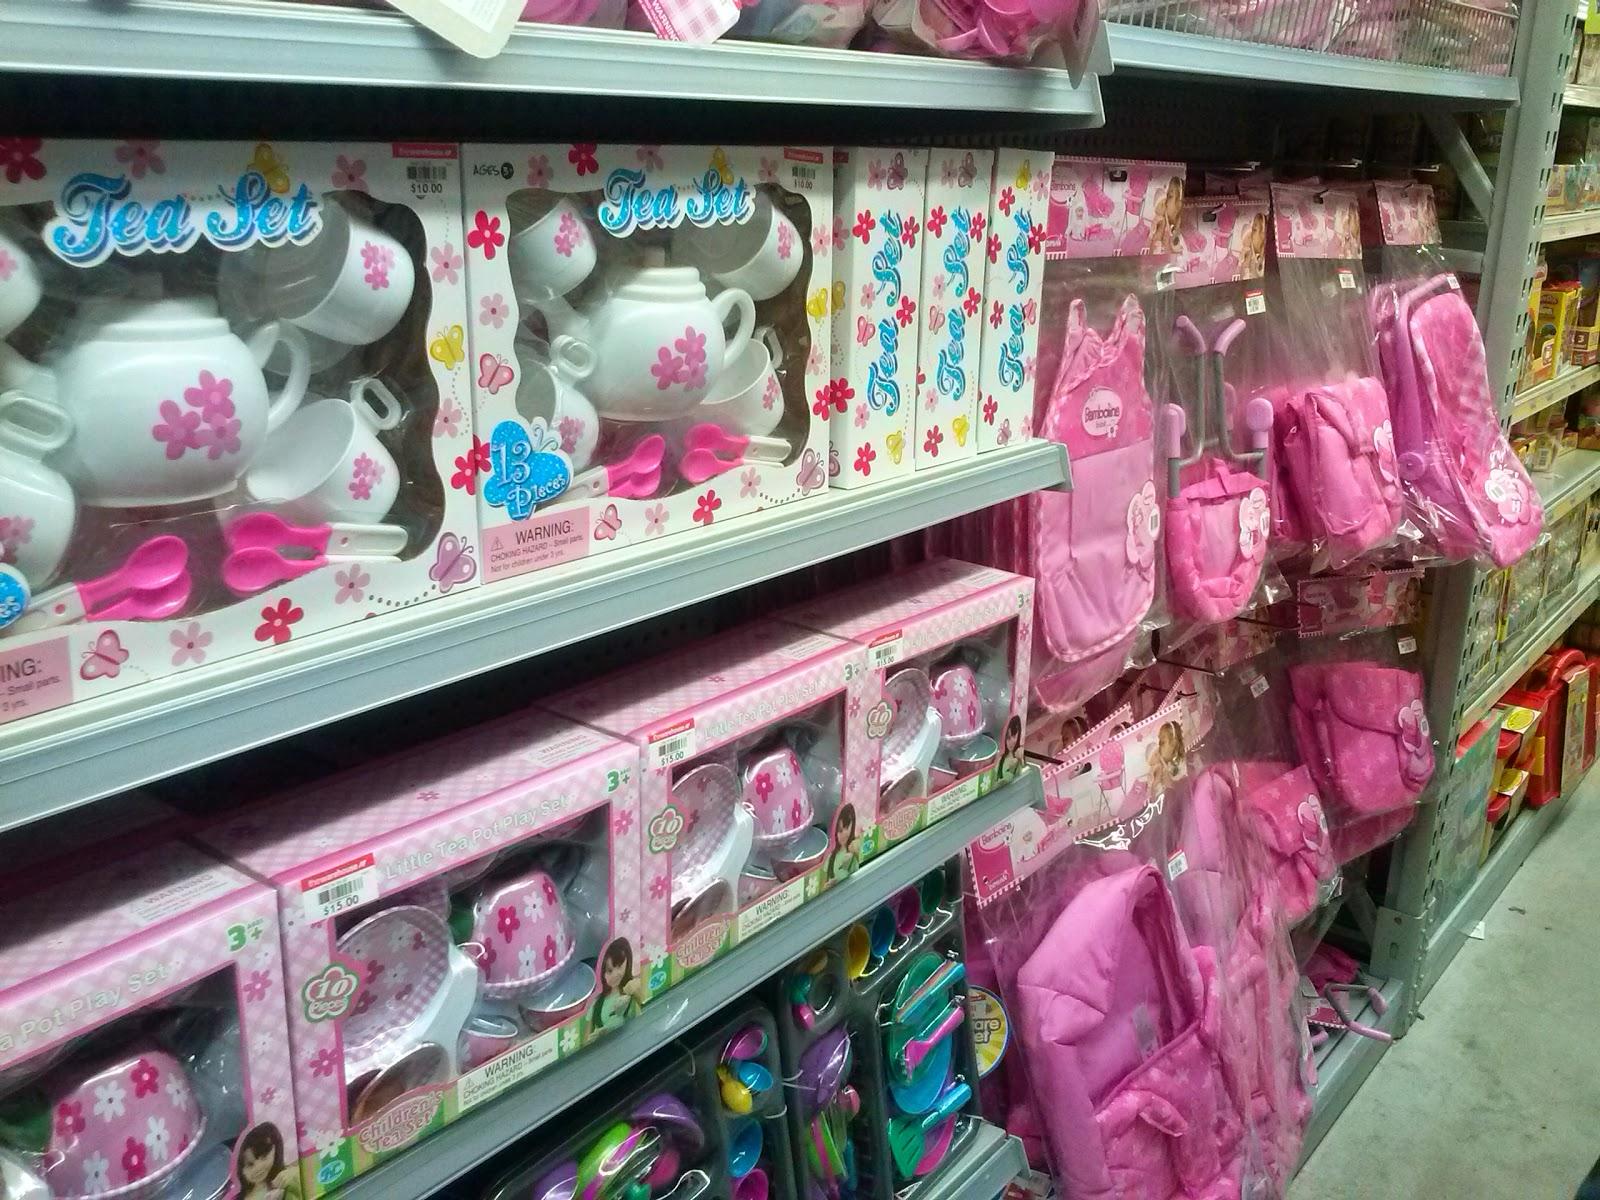 Think pink?